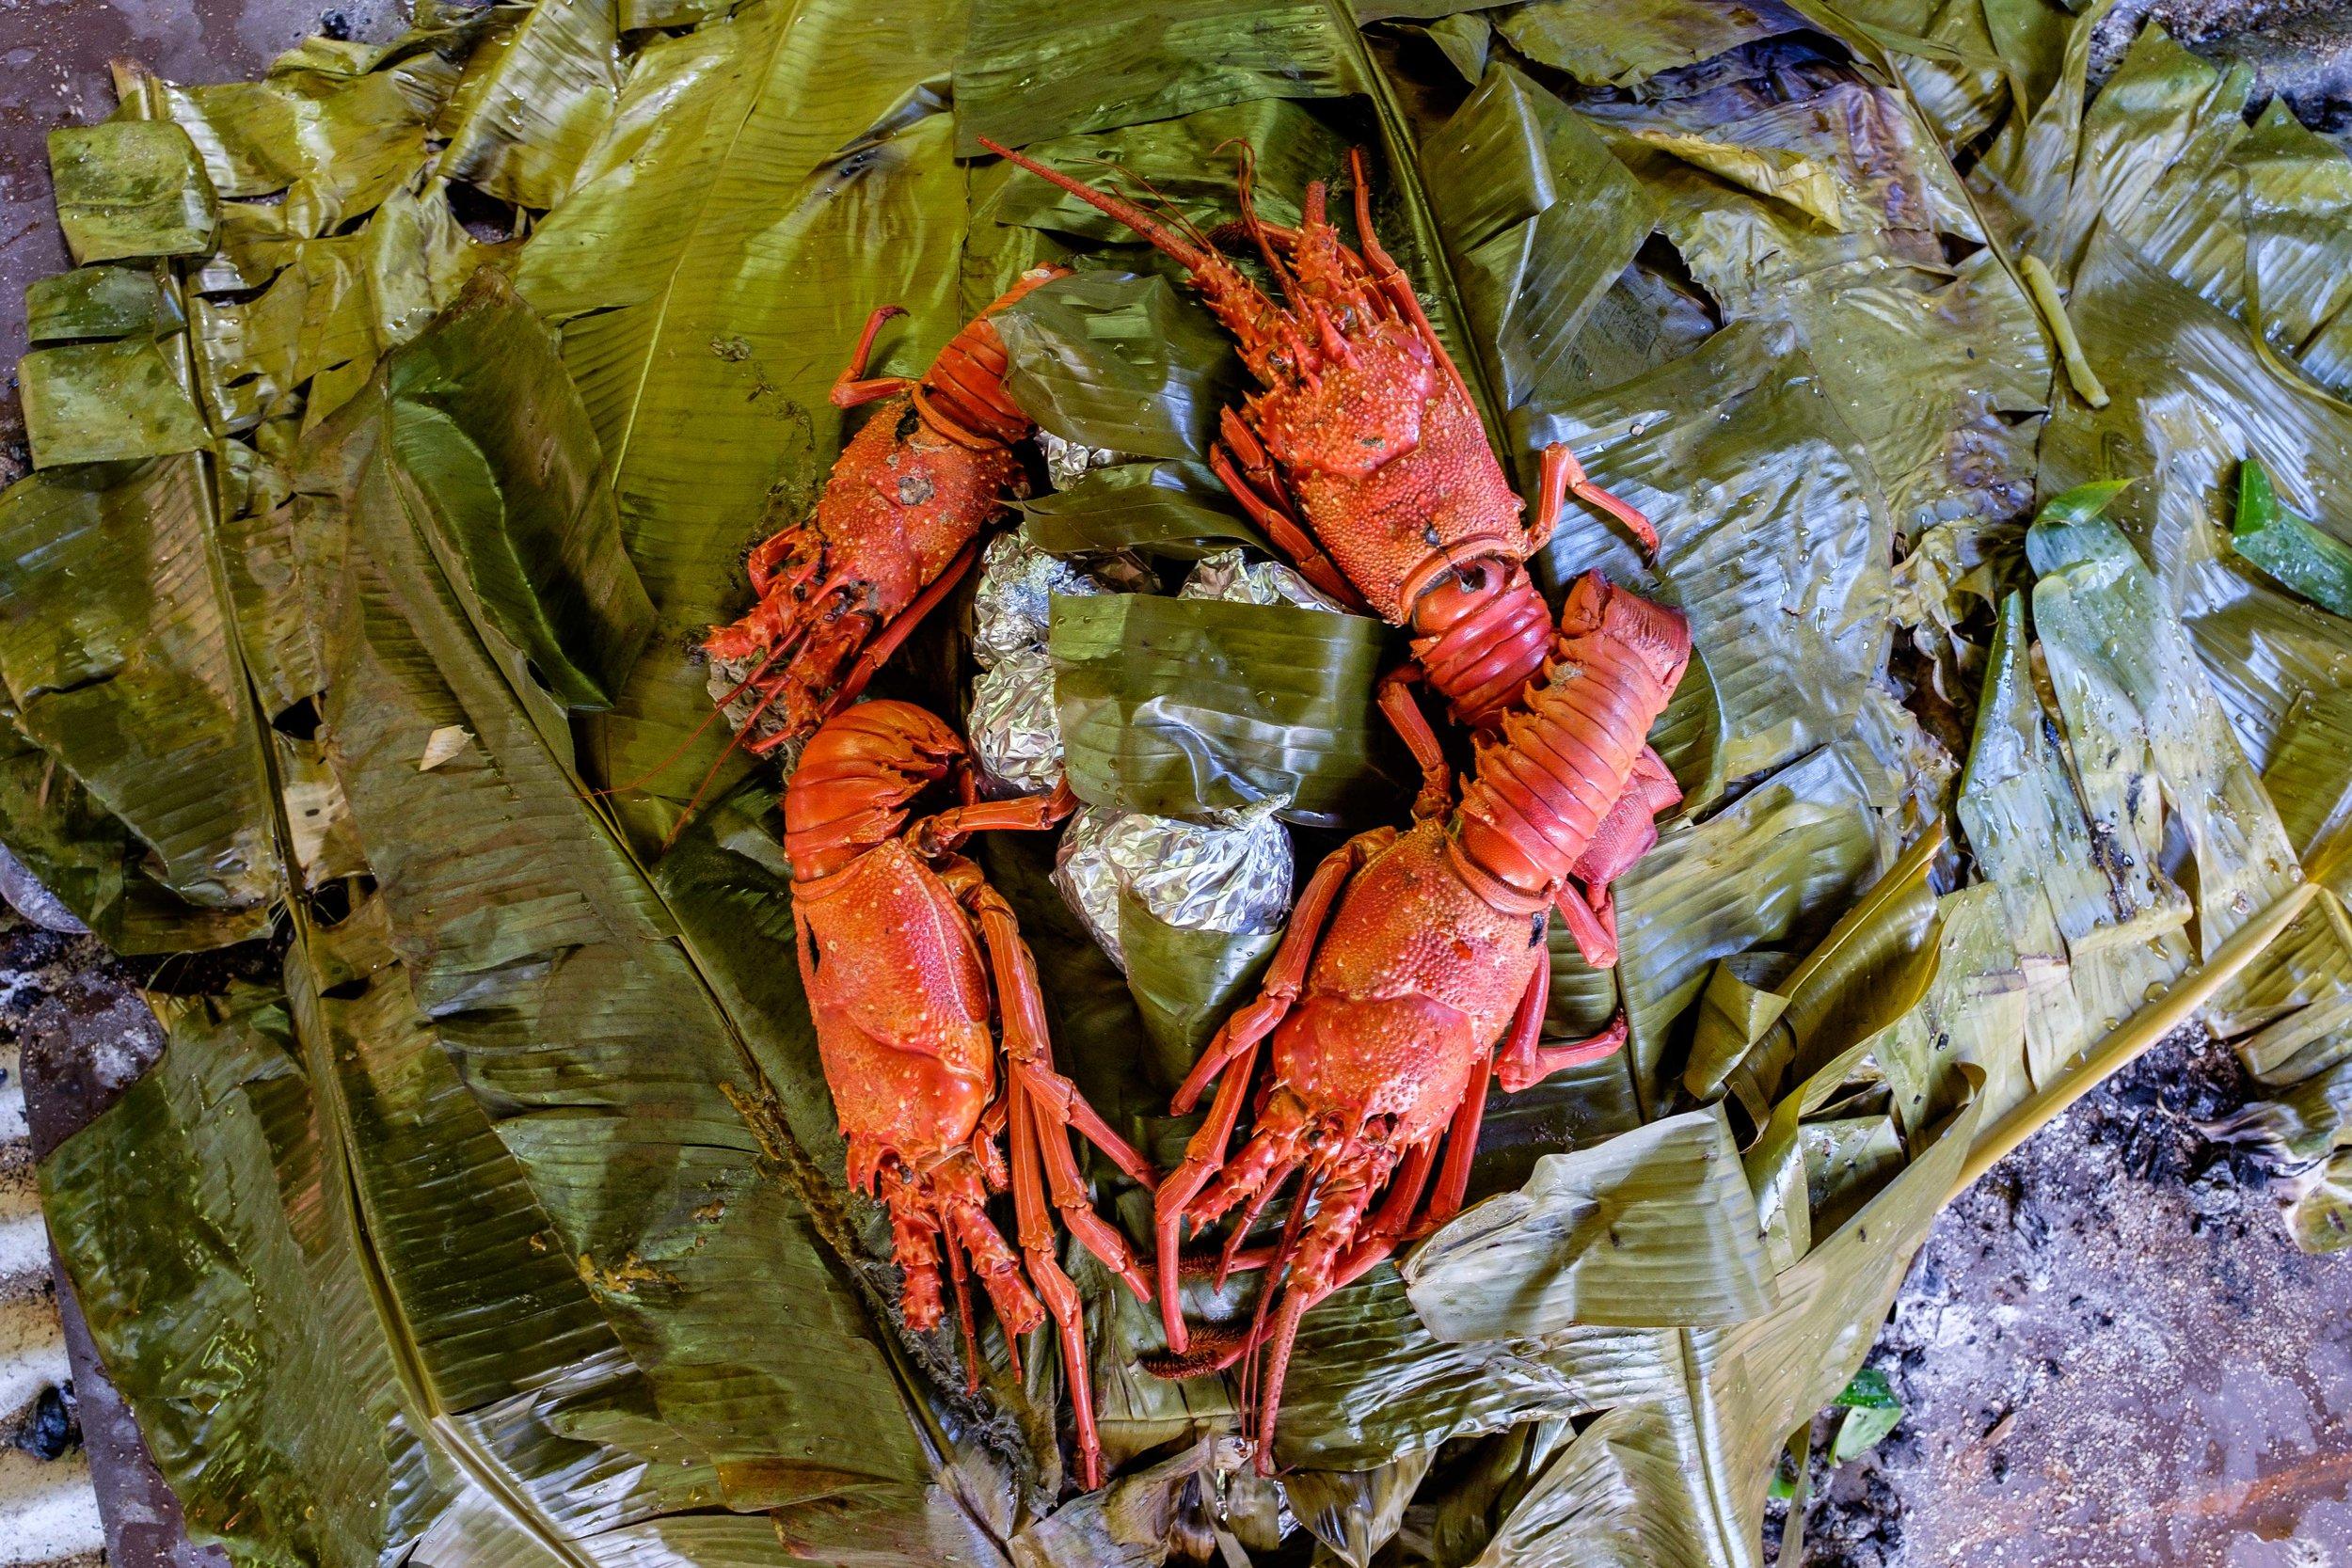 20161214-JI-American Samoa National Park-_DSF1030.jpg